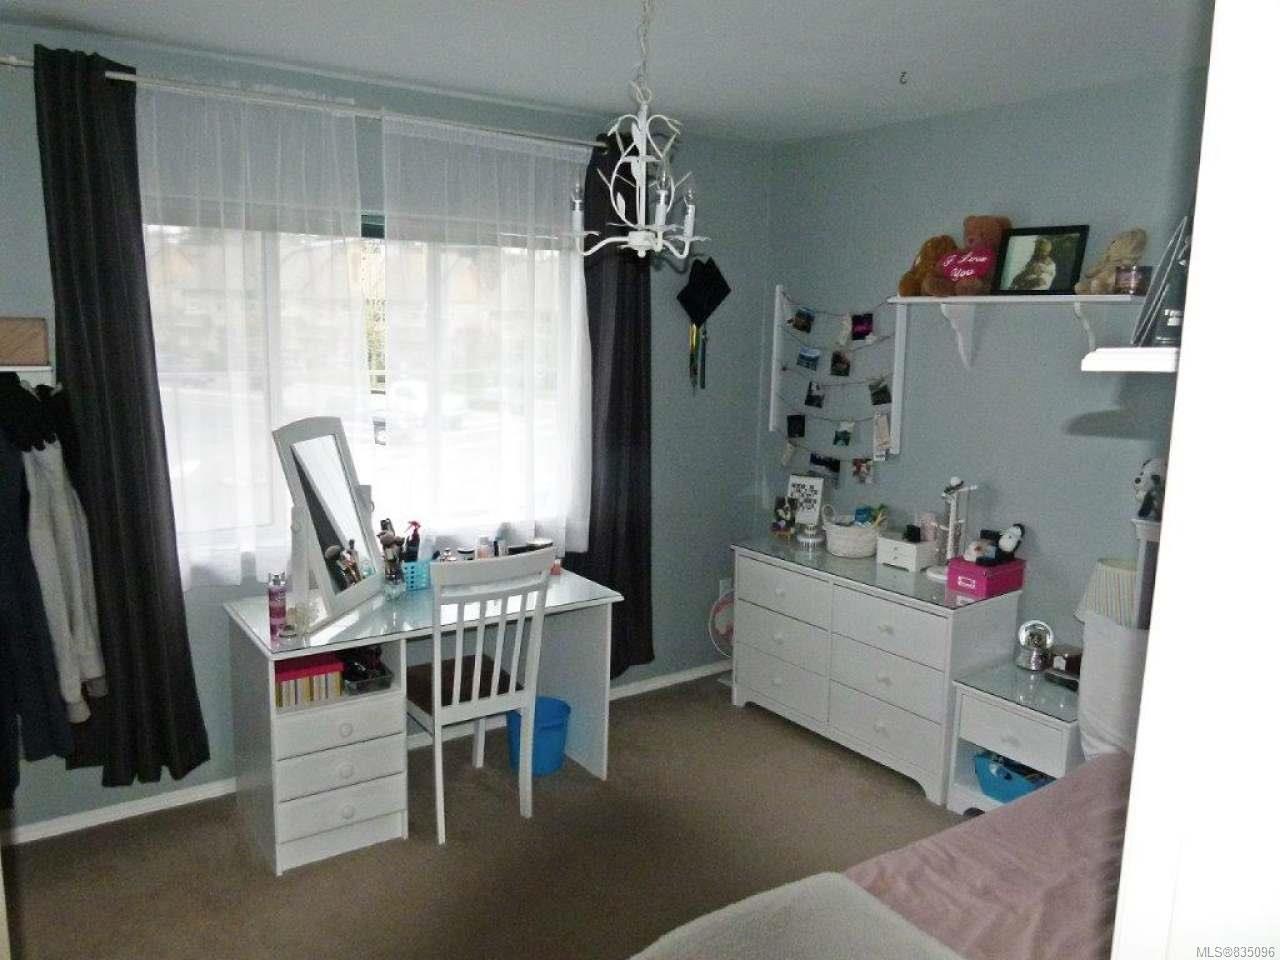 Photo 23: Photos: 2025 Bowen Rd in NANAIMO: Na Central Nanaimo Mixed Use for sale (Nanaimo)  : MLS®# 835096